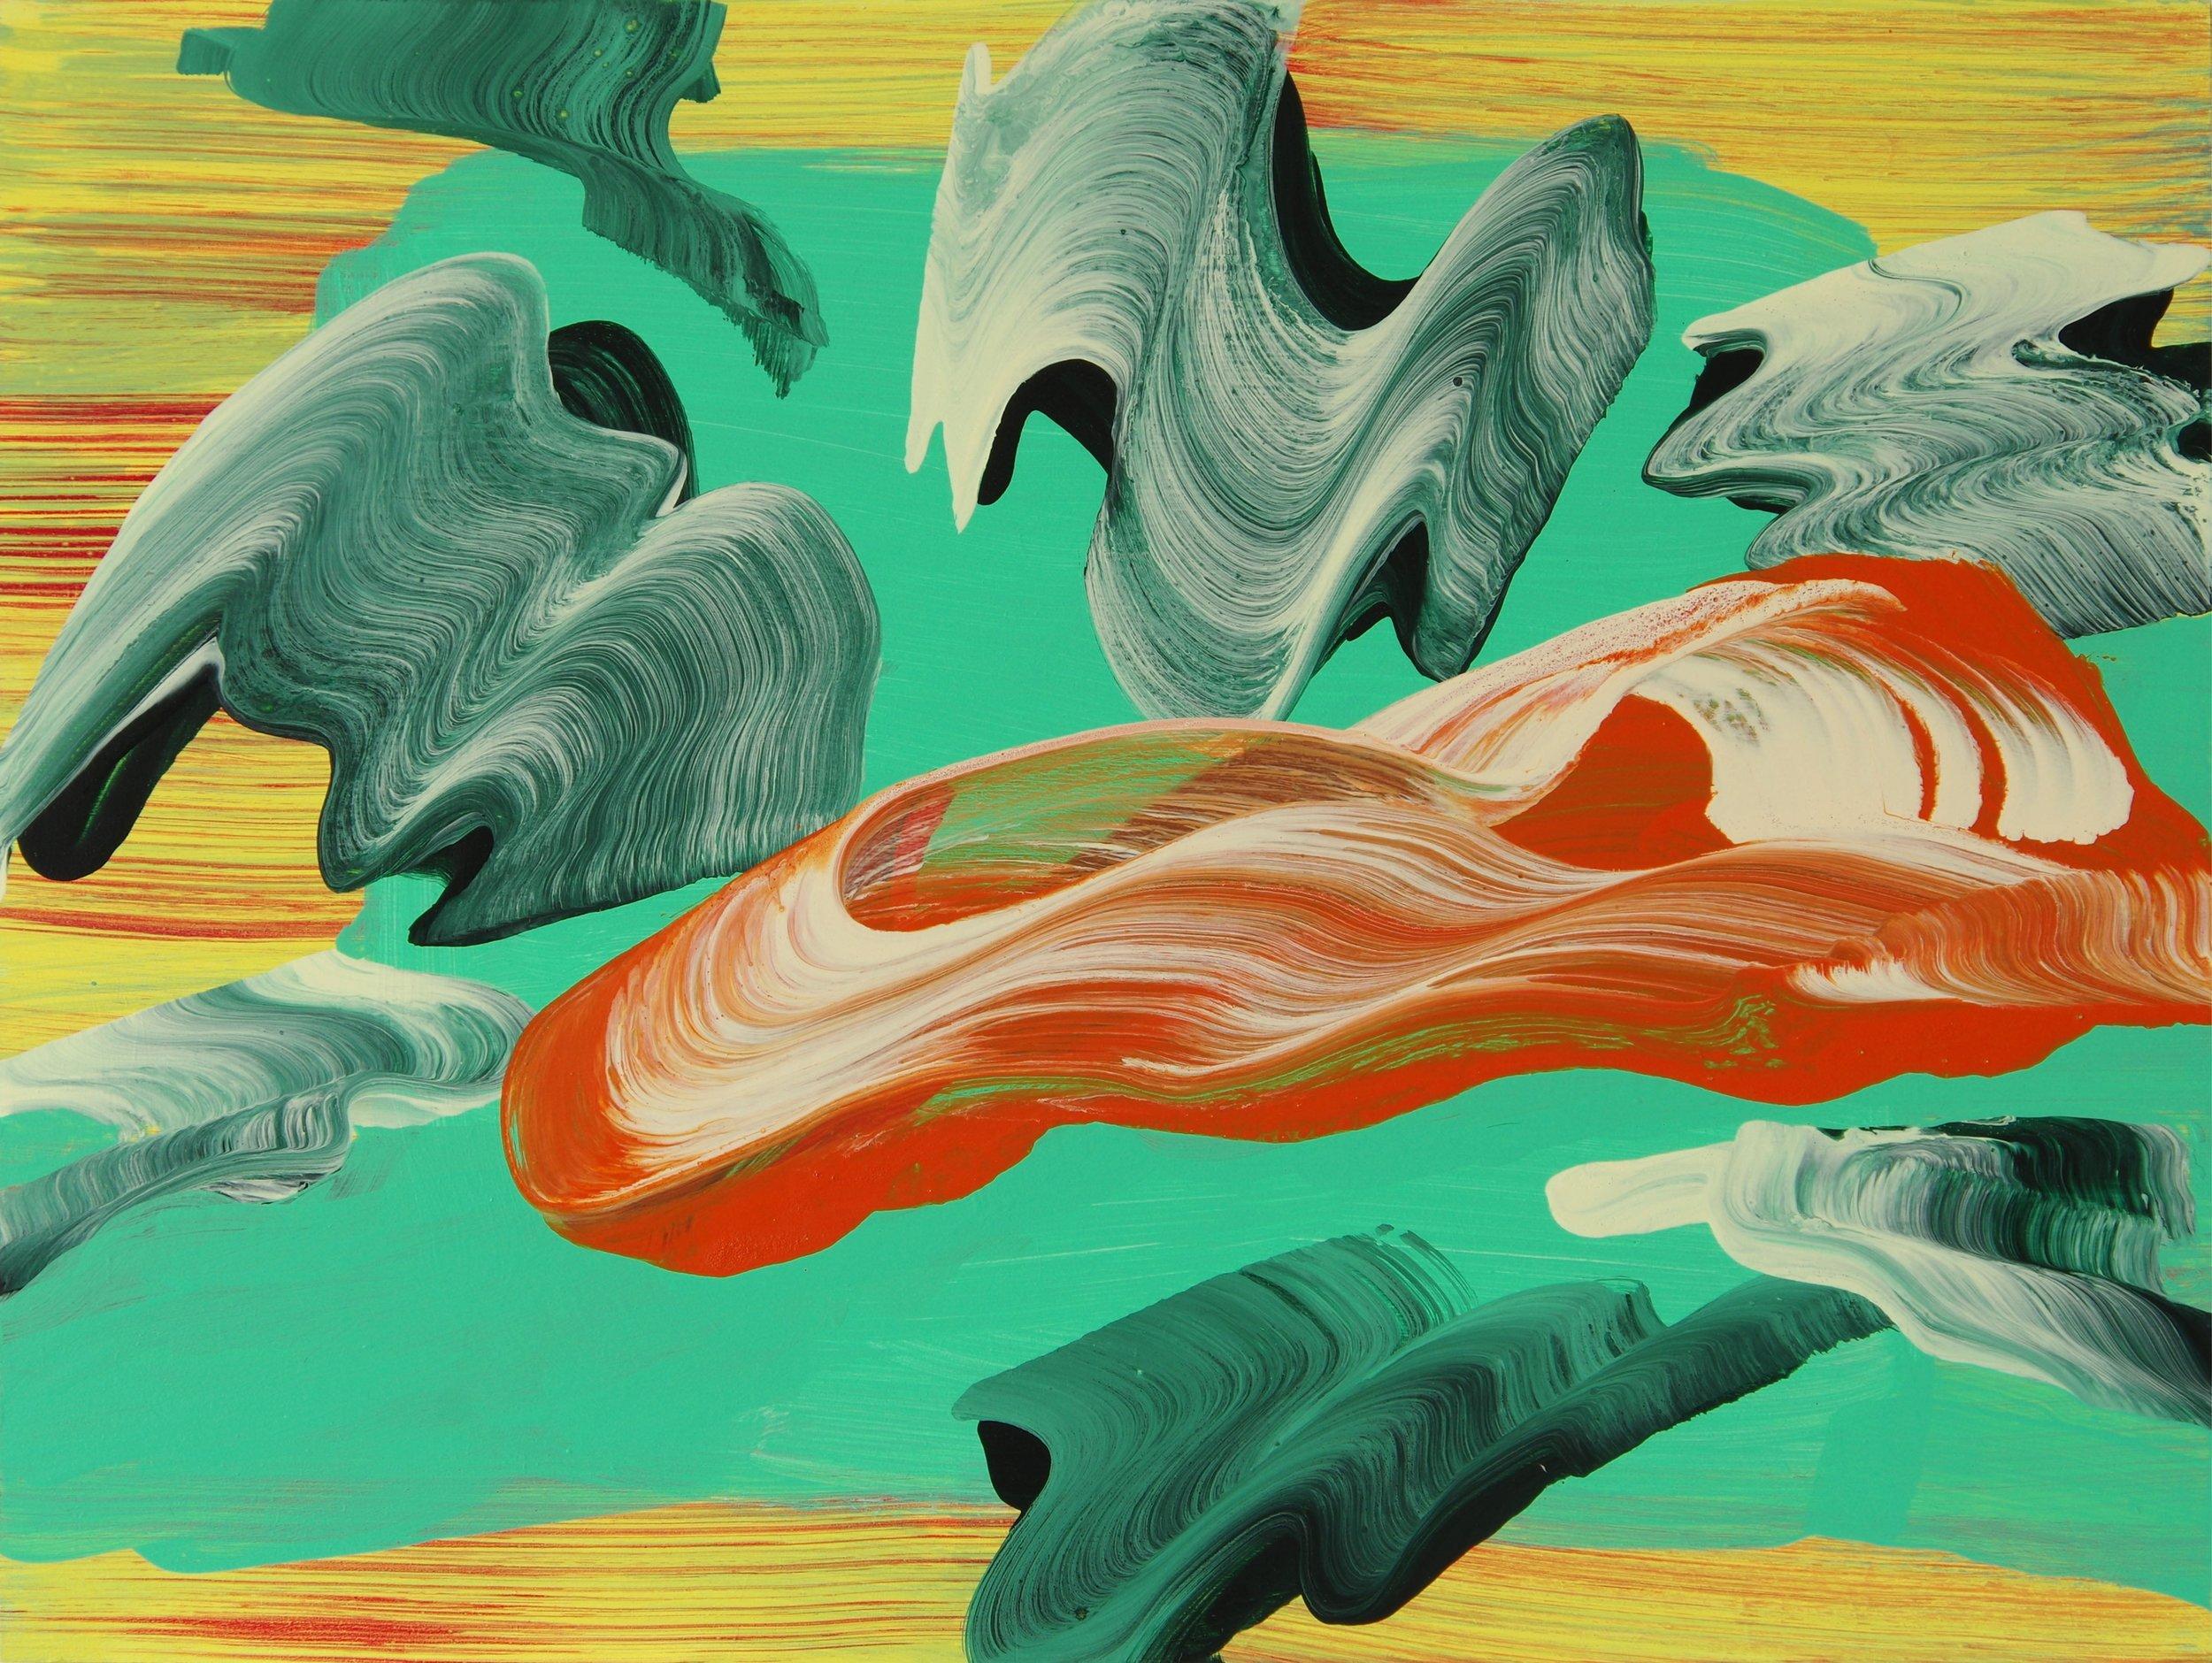 Flat-out - MARK SOWDEN, Artist  Oct 2, 2016